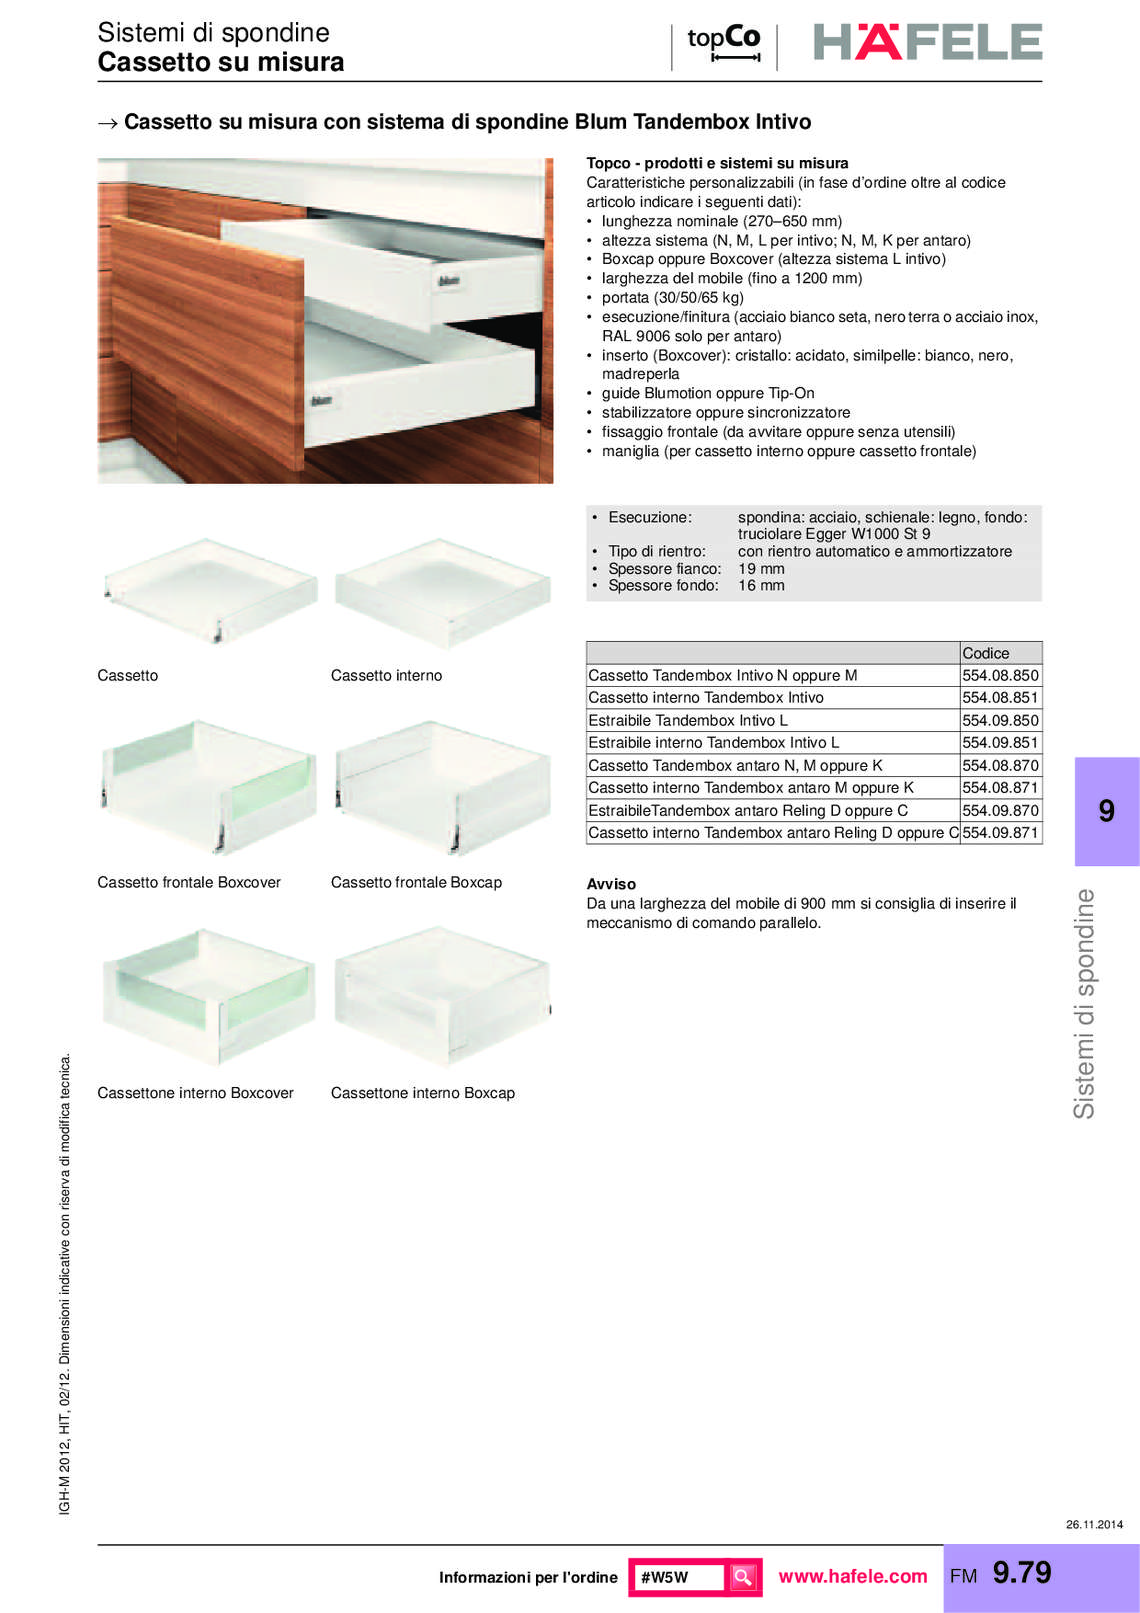 hafele-spondine-e-guide-per-mobili_40_102.jpg